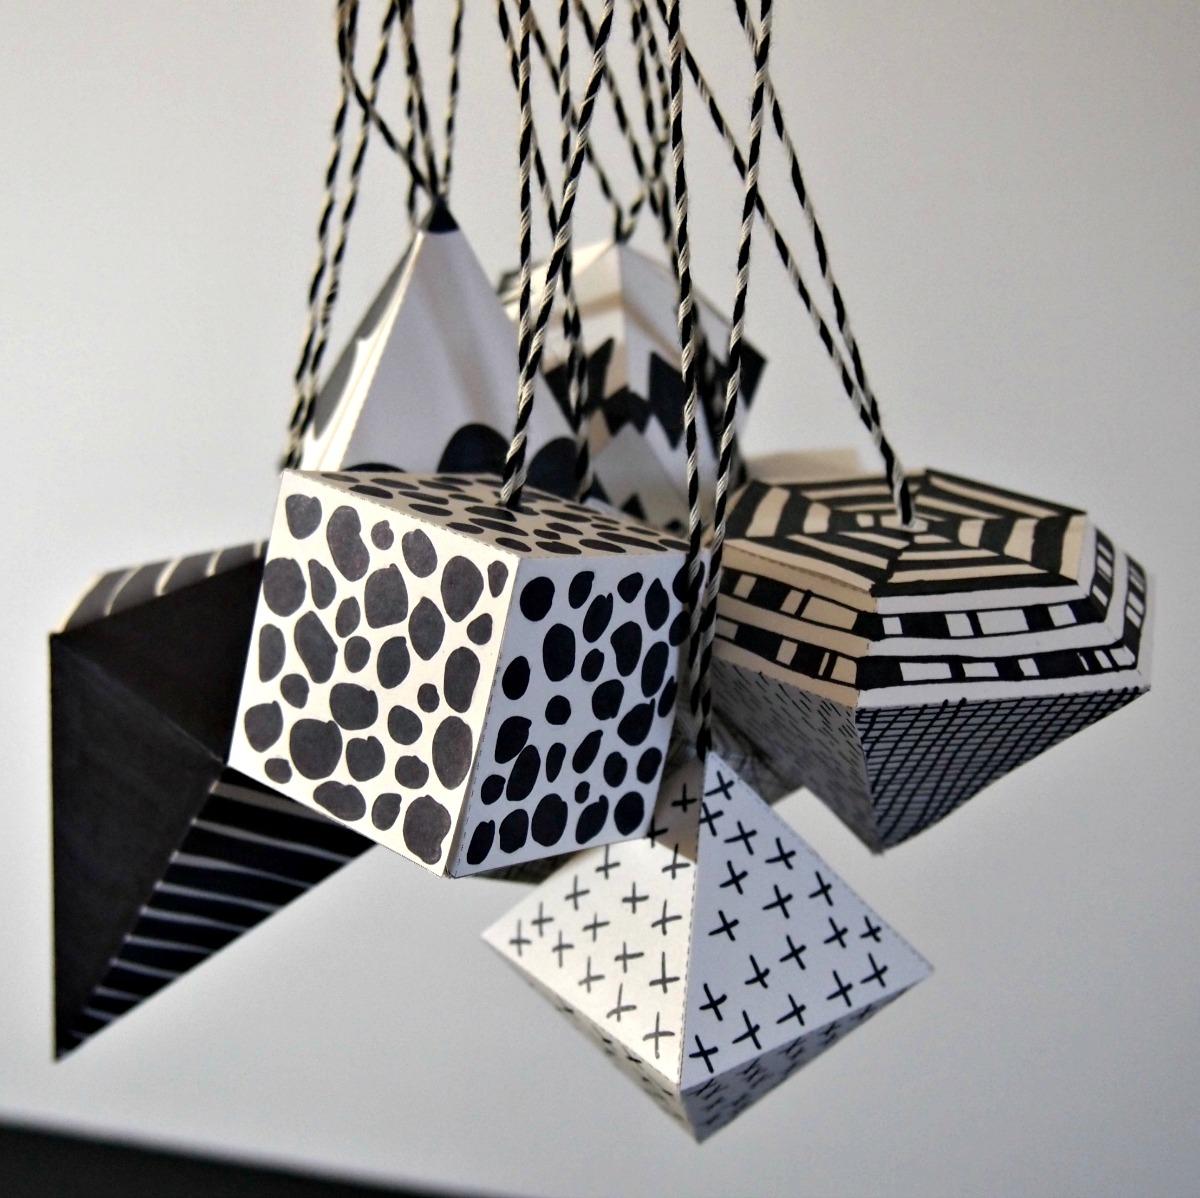 Black and white ornaments